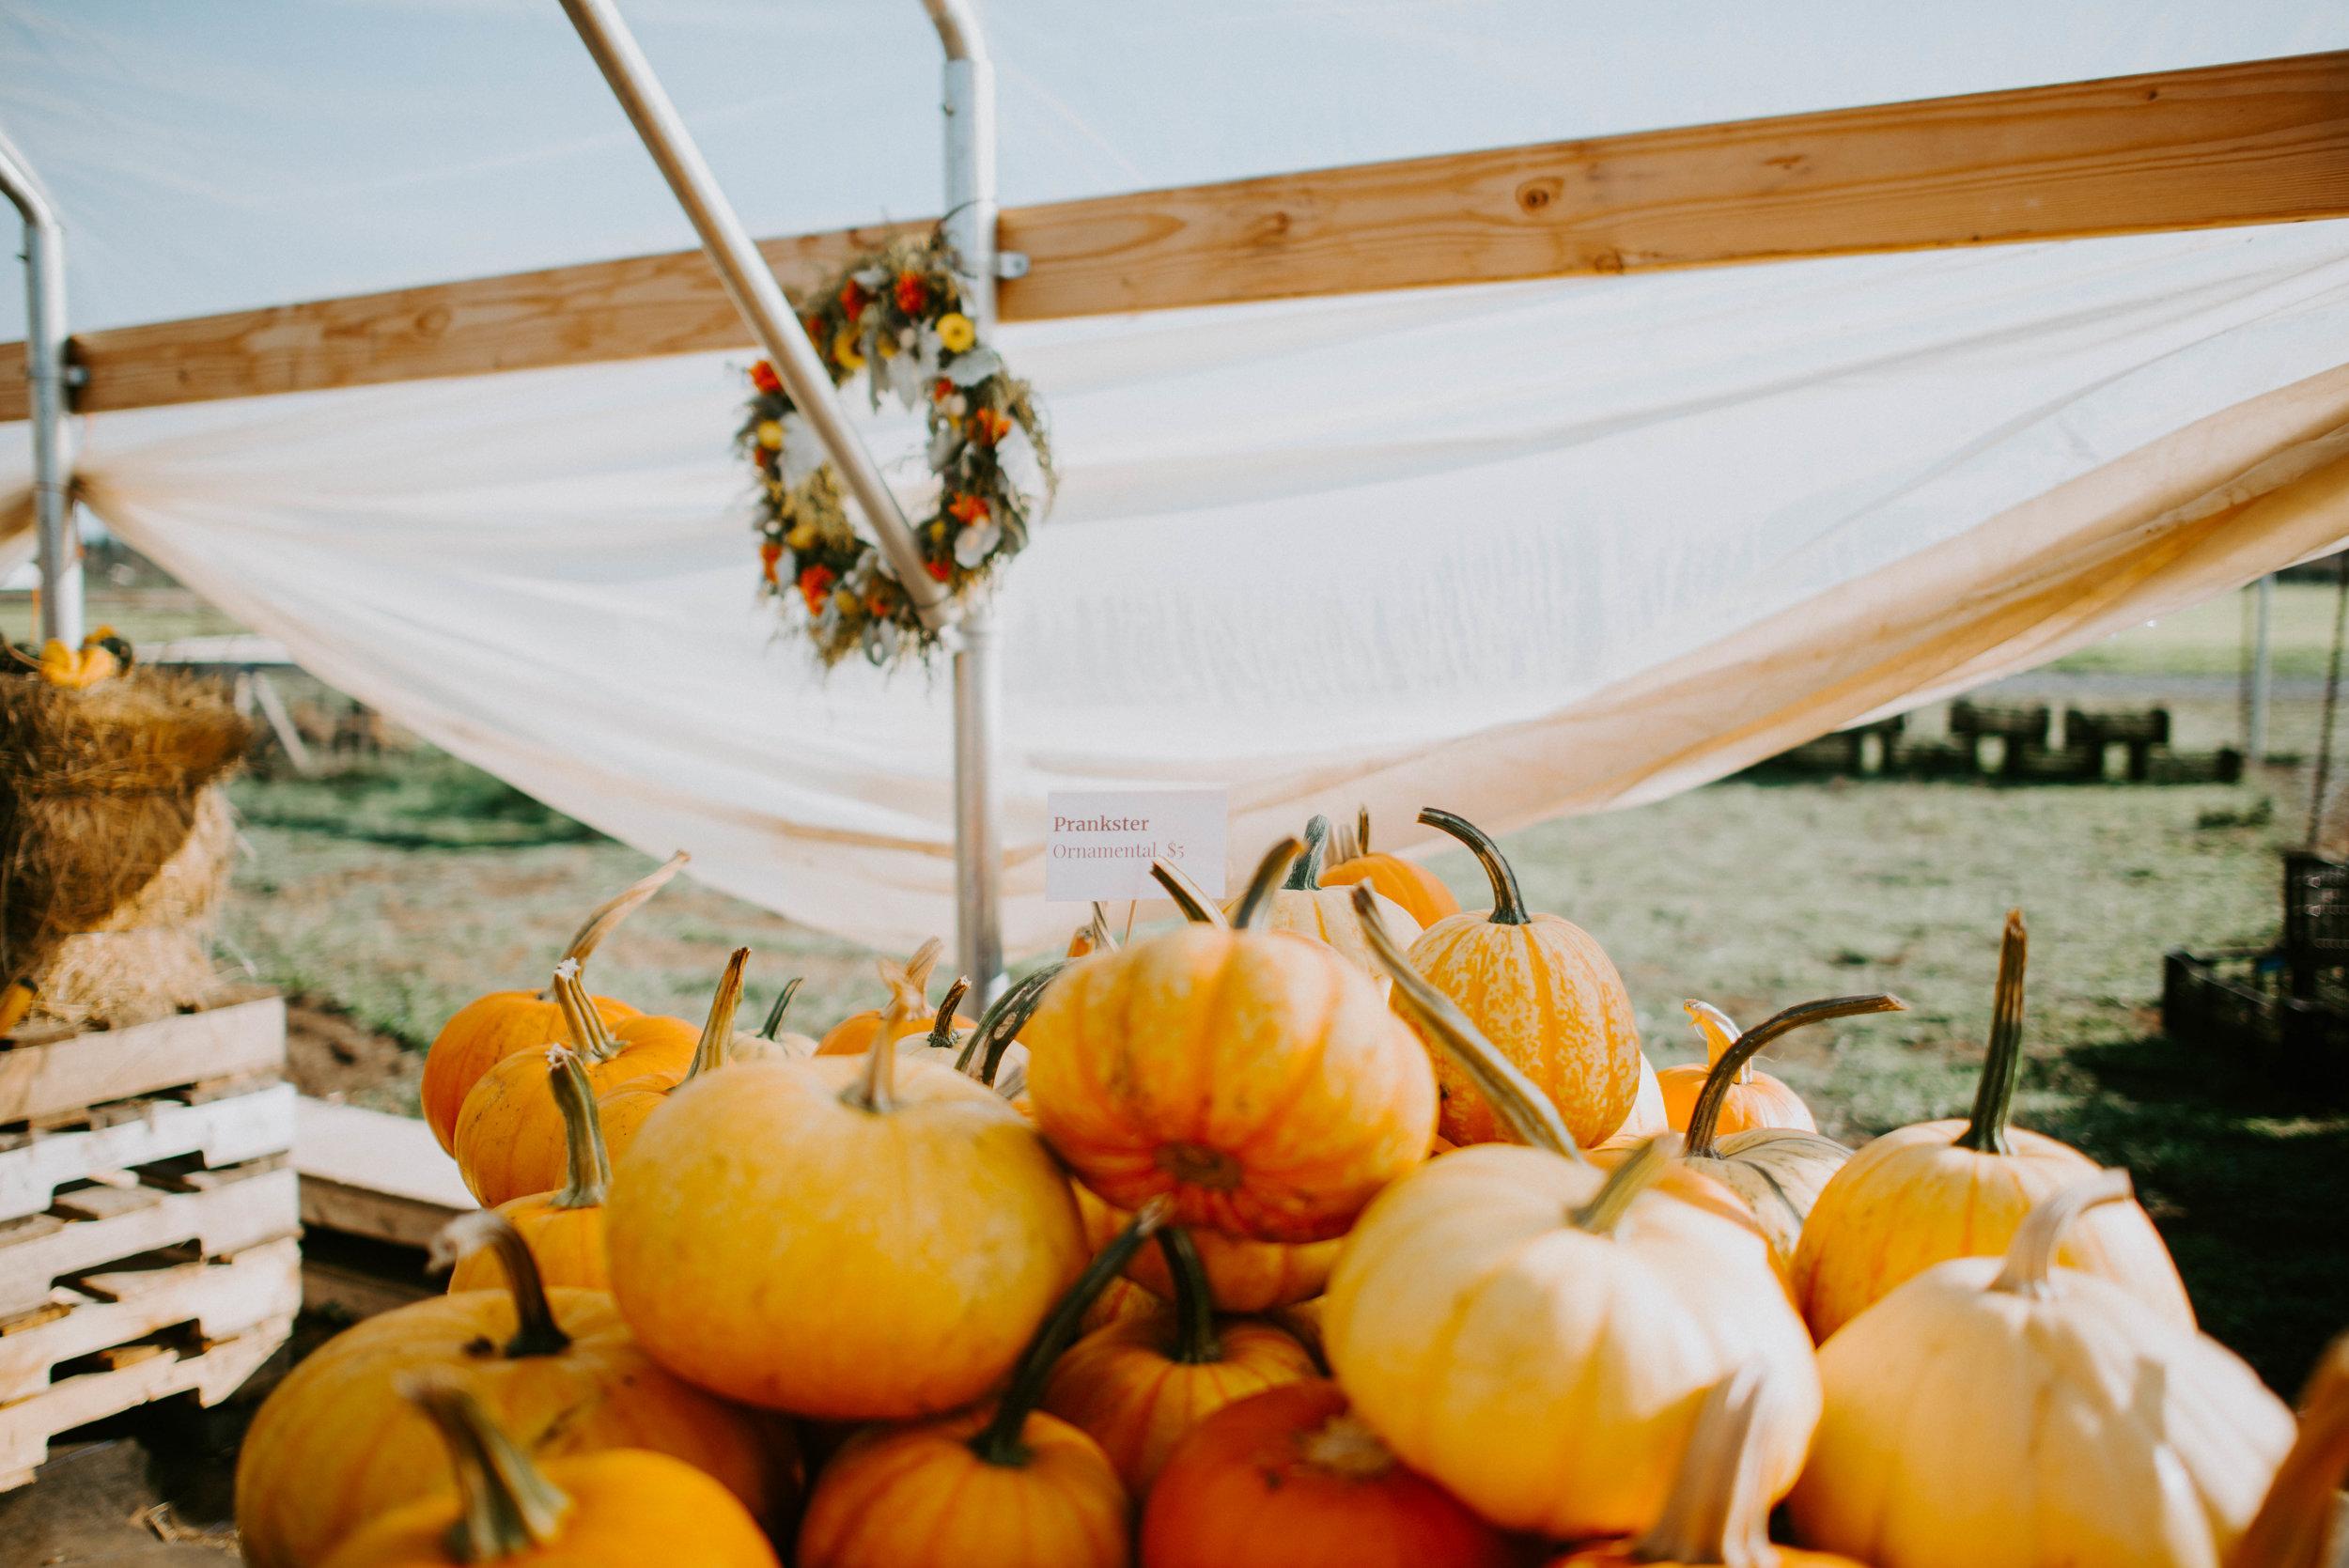 Ferndale Pumpkin Patch